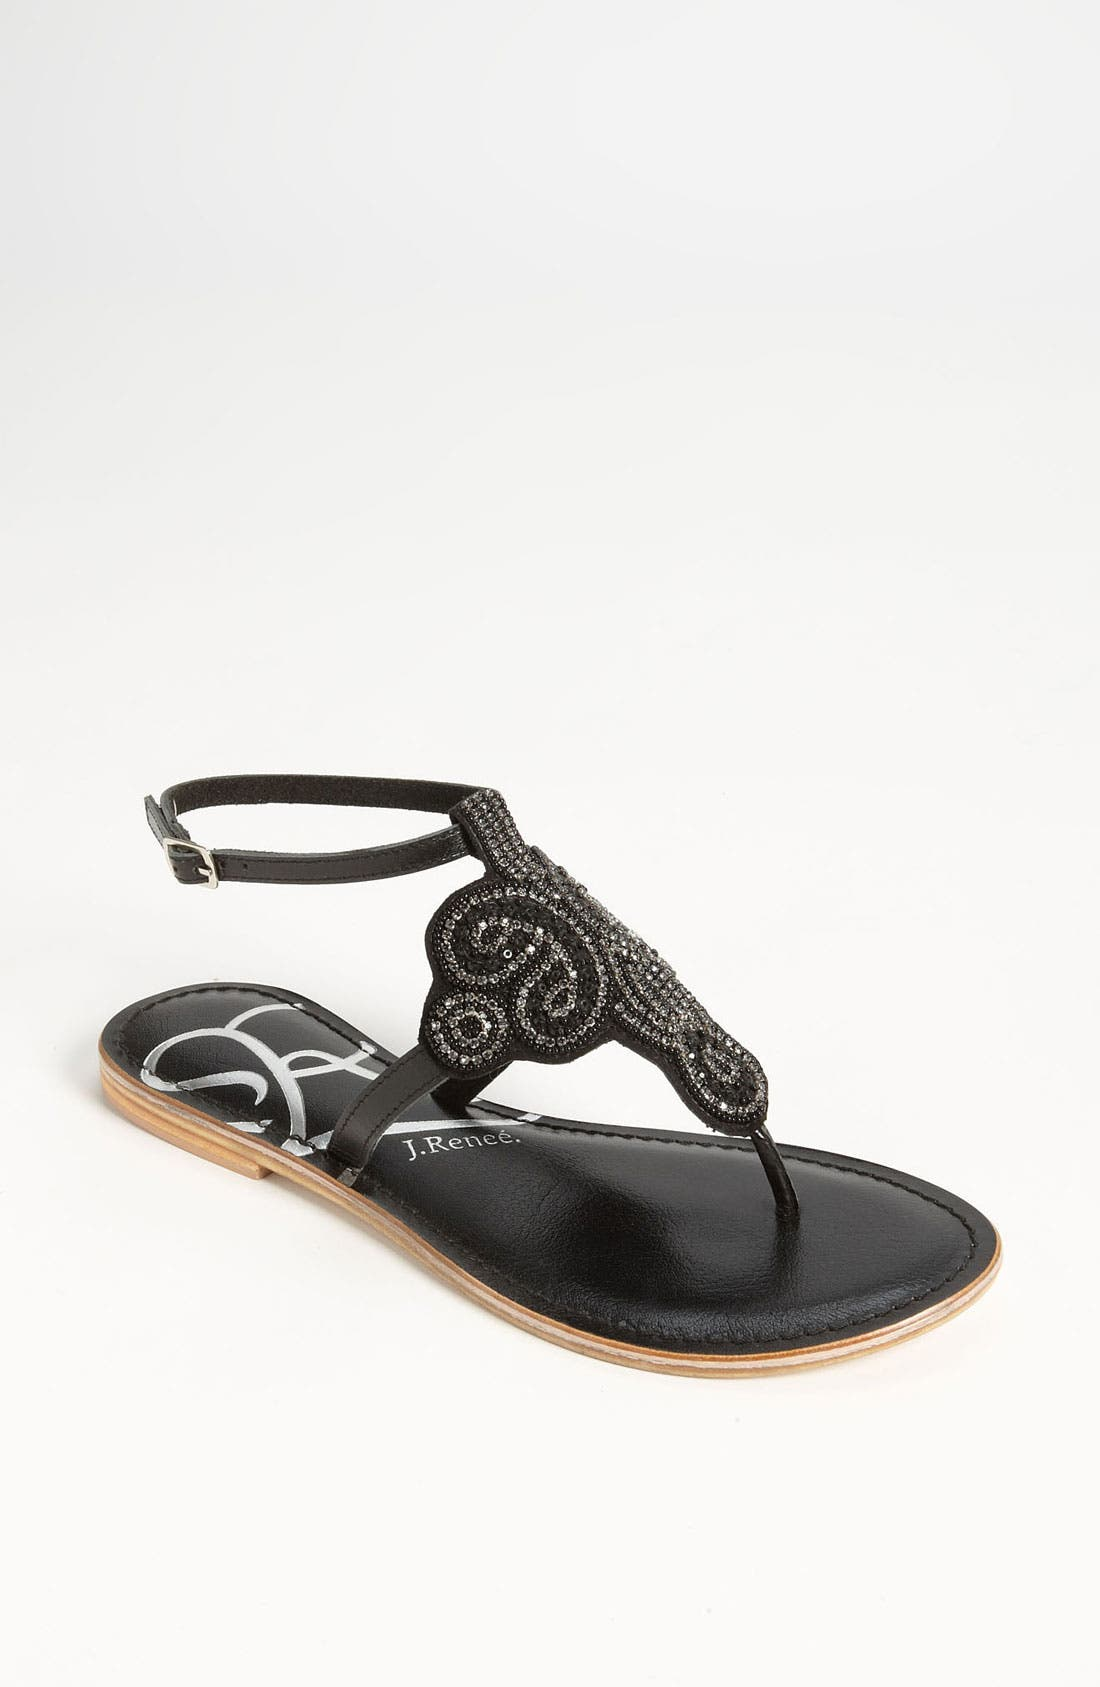 Alternate Image 1 Selected - J. Reneé 'Glint' Sandal